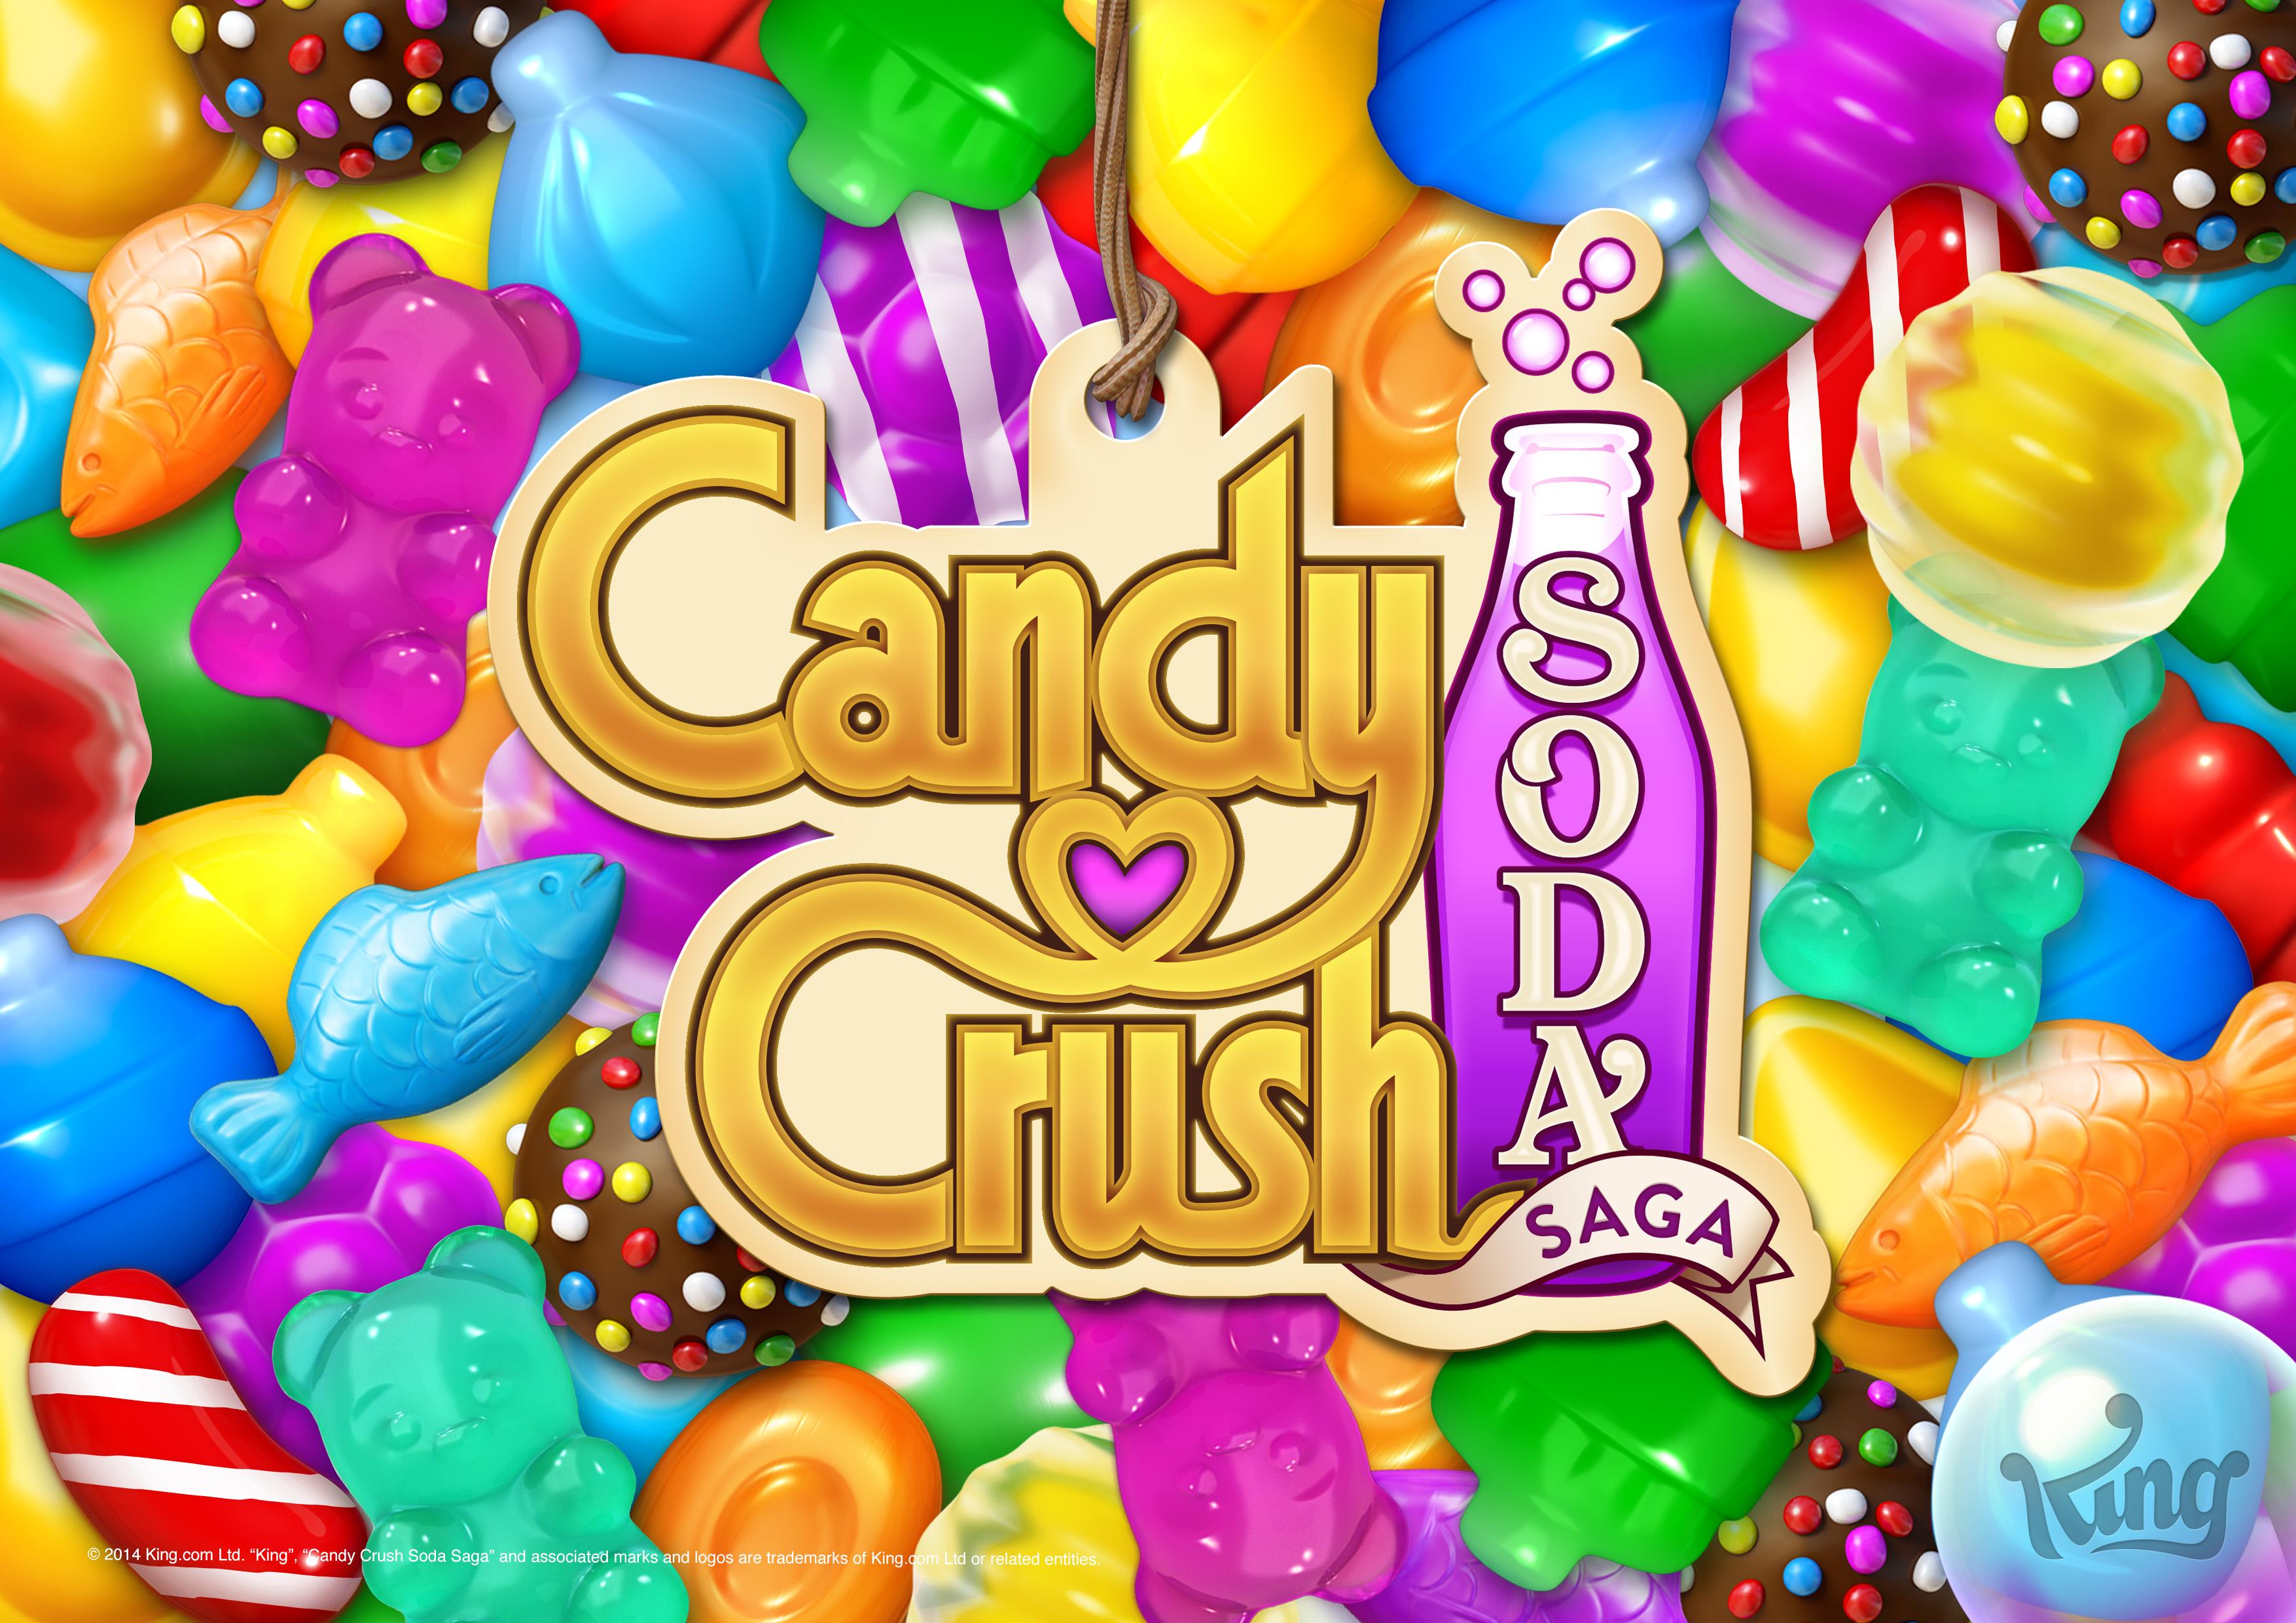 Candy Crush Soda Saga mobile game logo